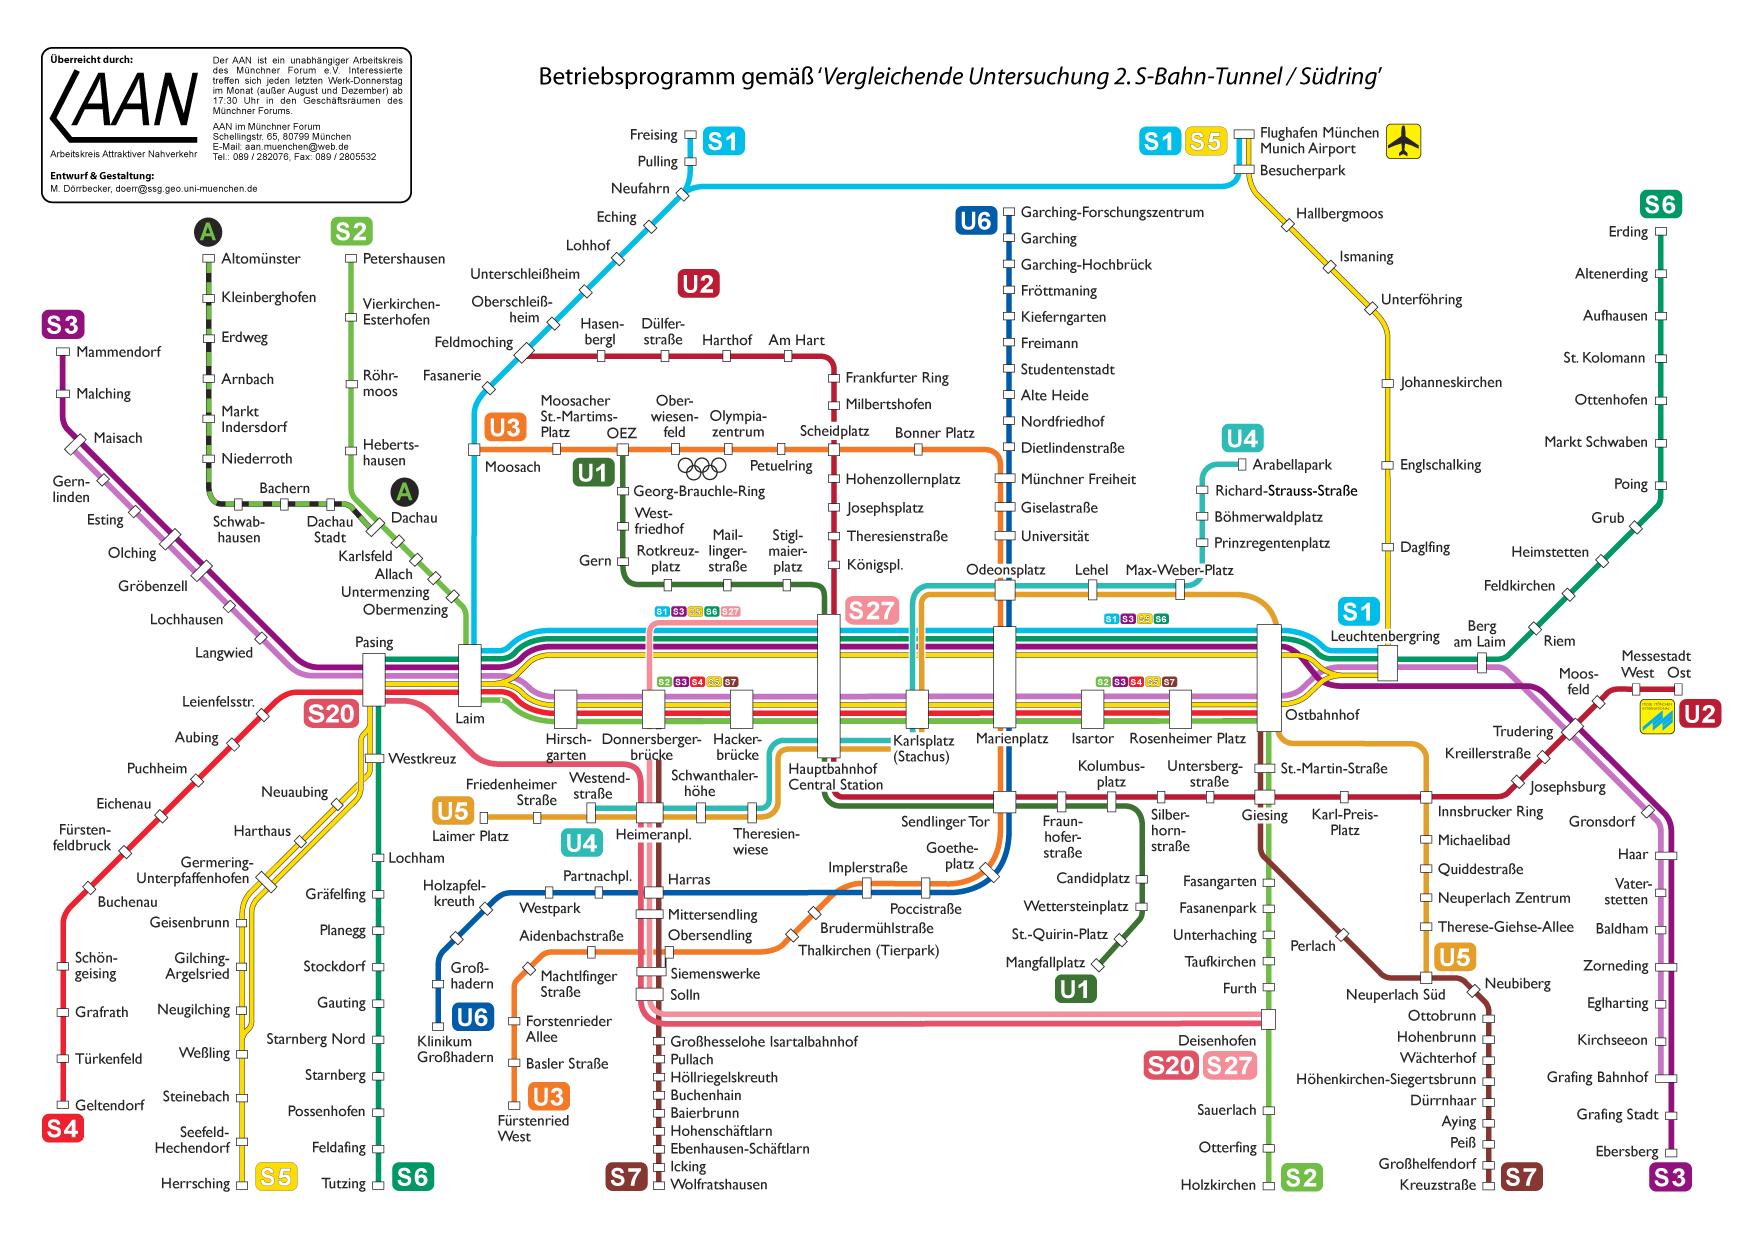 muenchen s bahn public transport maps pinterest munich public transport and subway map. Black Bedroom Furniture Sets. Home Design Ideas